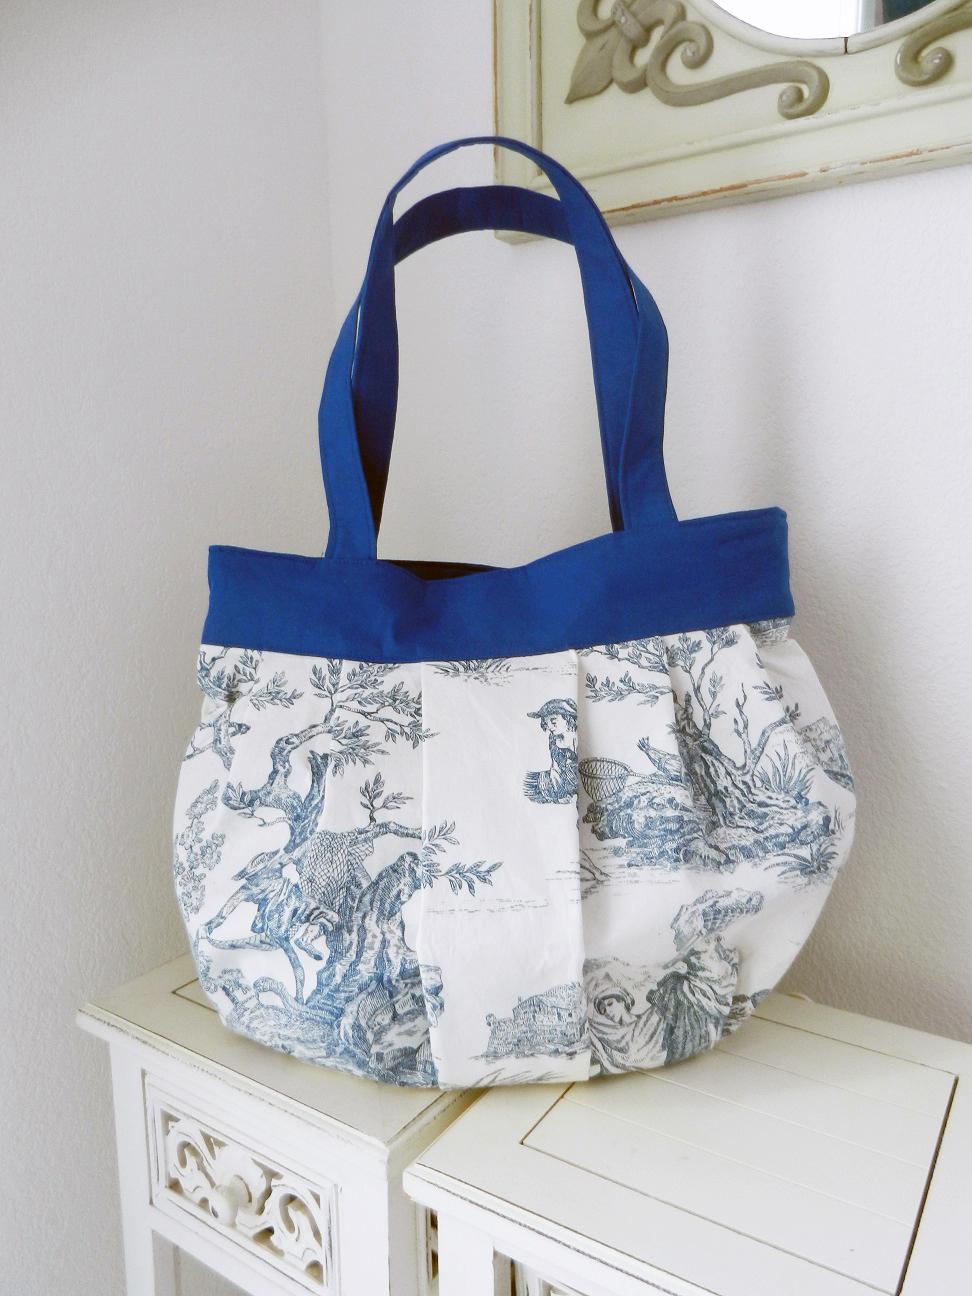 Duchesse or ange doas 1 sac marina toile de jouy bleu a